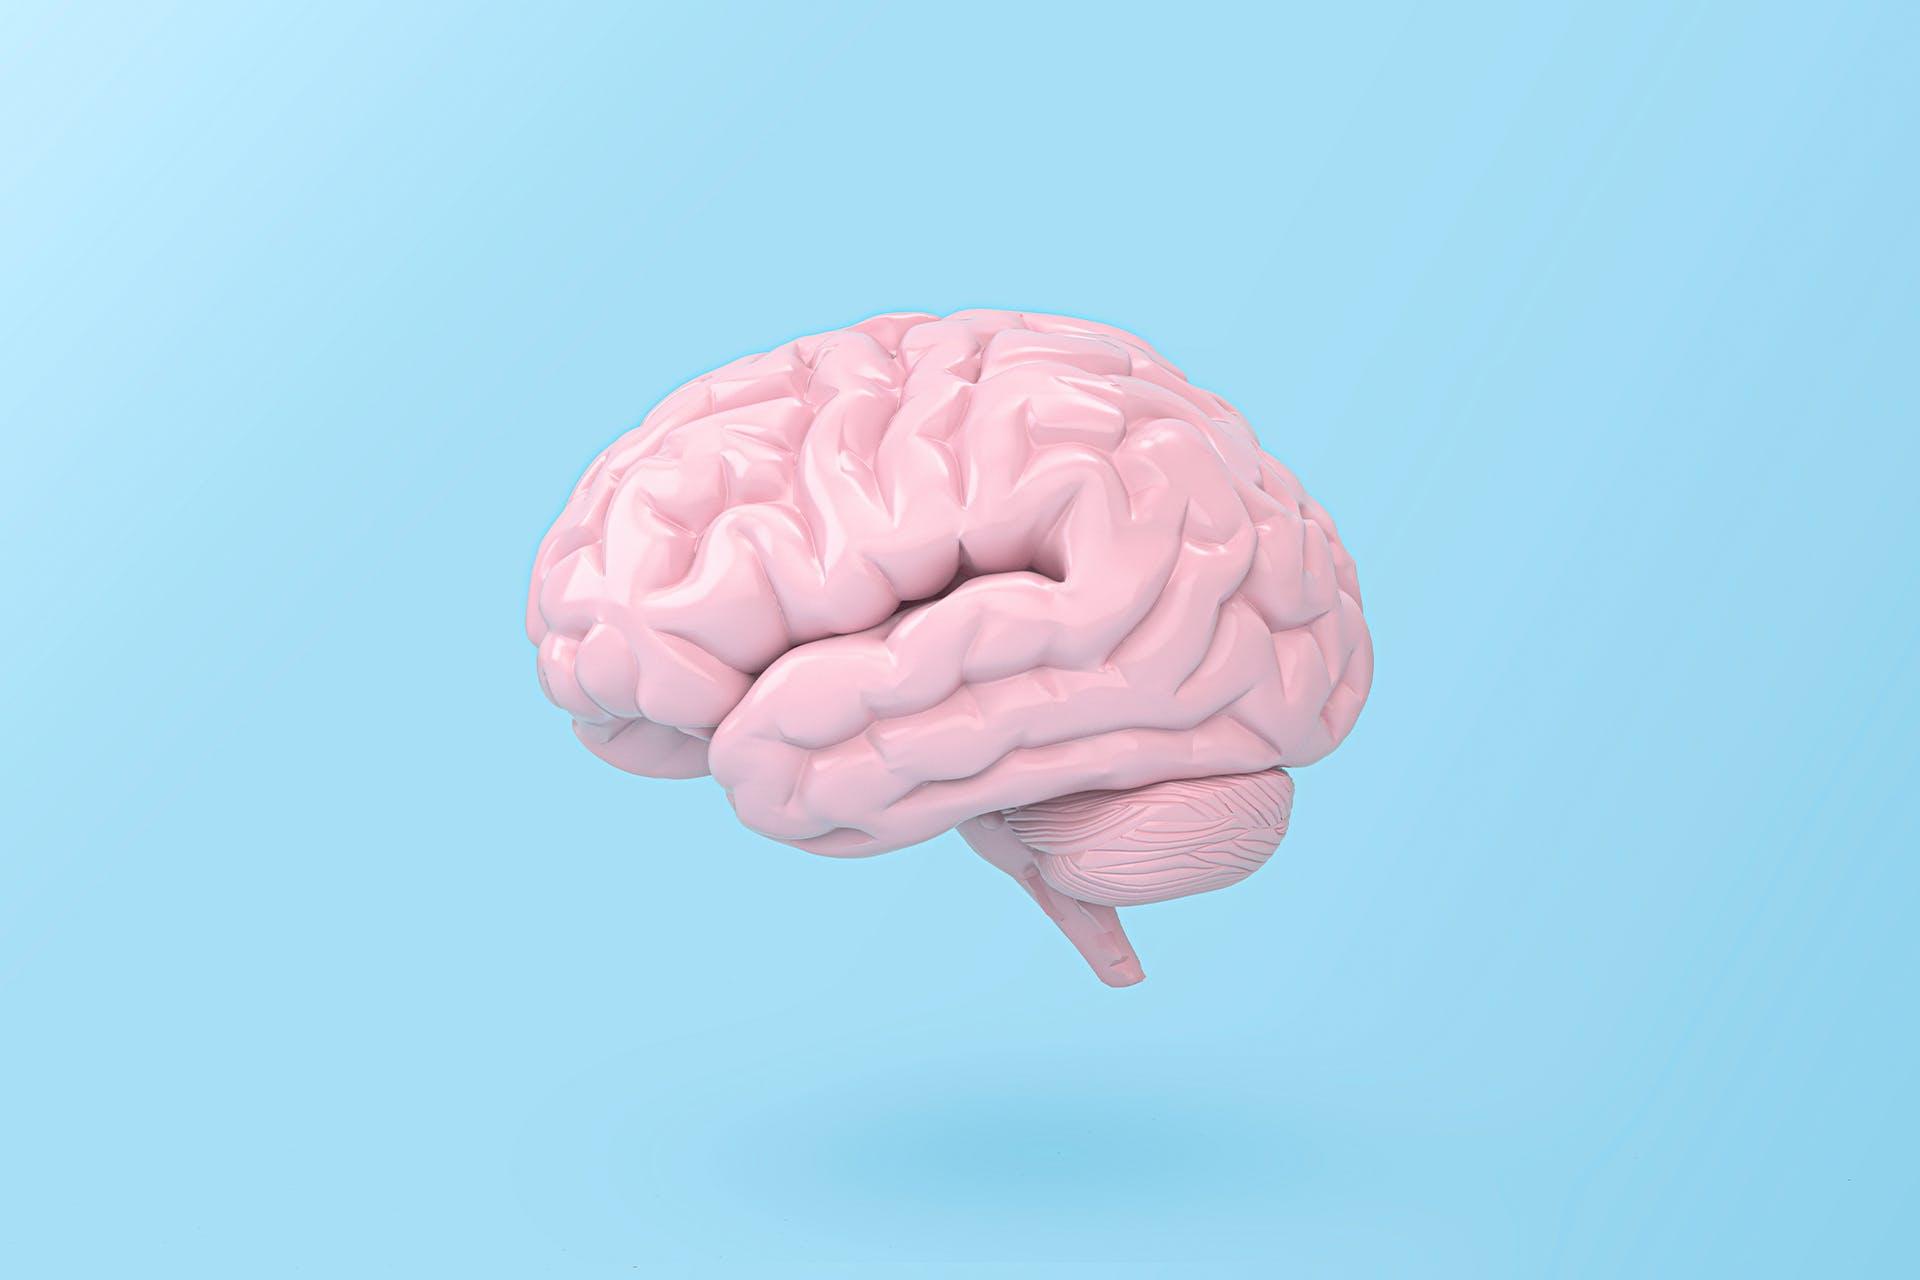 Image of human brain on blue background. Psychology of social media blog post